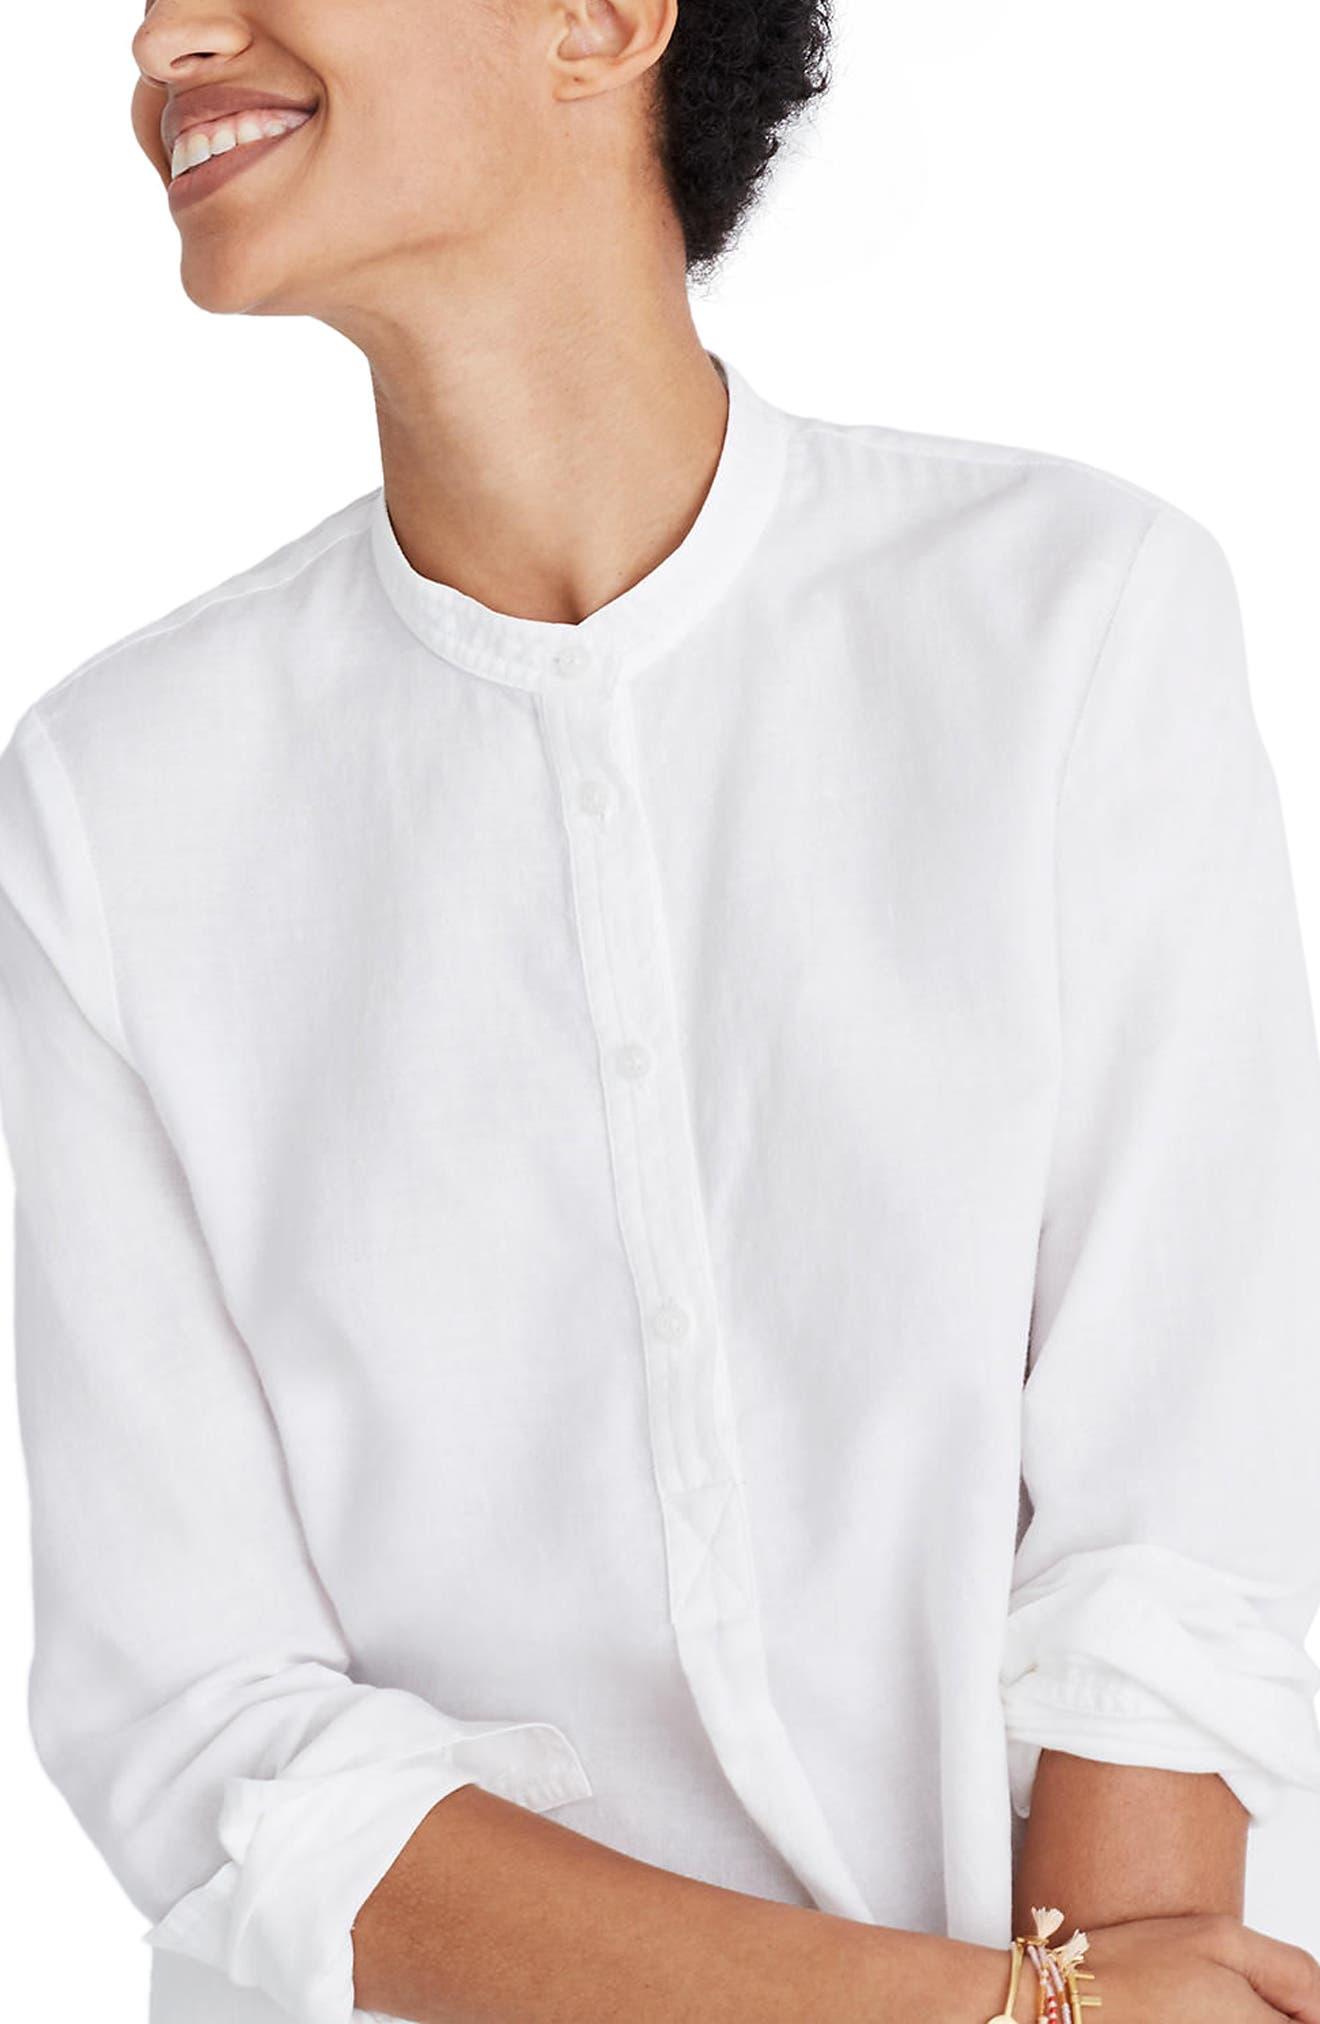 Wellspring Tunic Popover Shirt,                         Main,                         color, Eyelet White